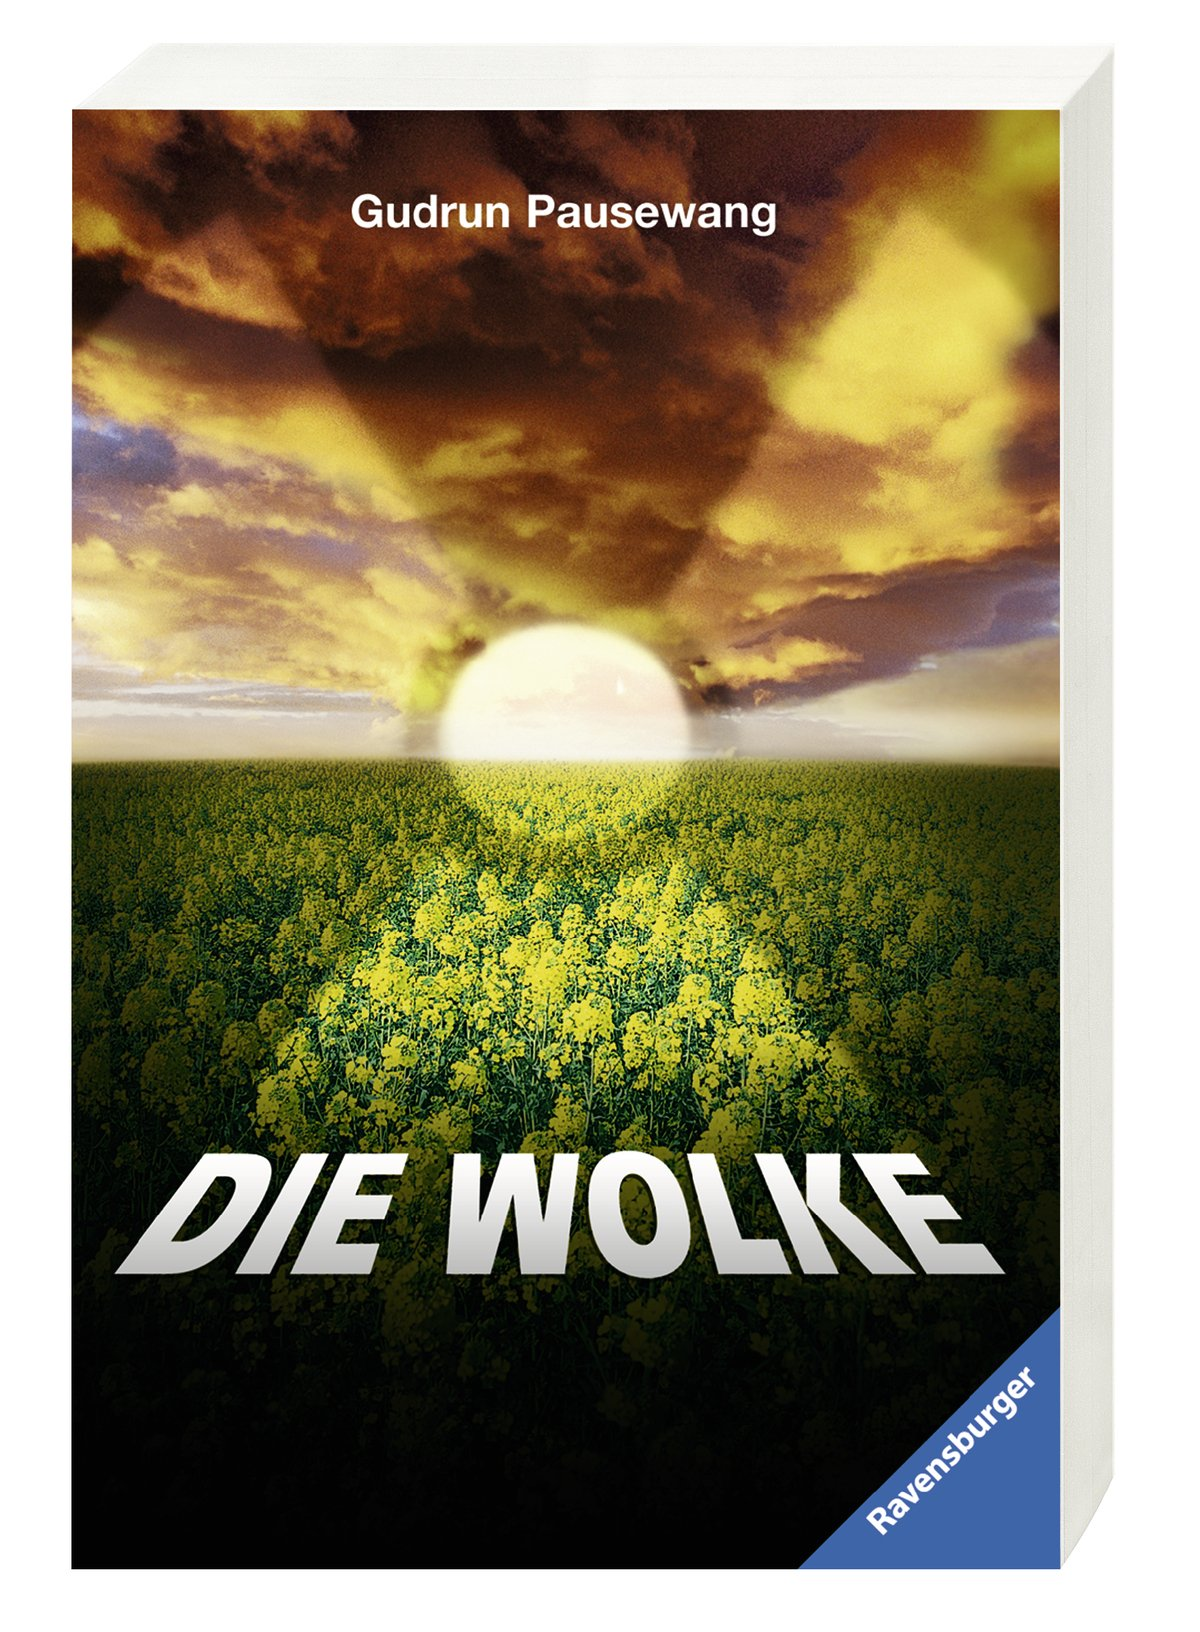 Die Wolke: Gudrun Pausewang: 9783473580149: Amazon.com: Books